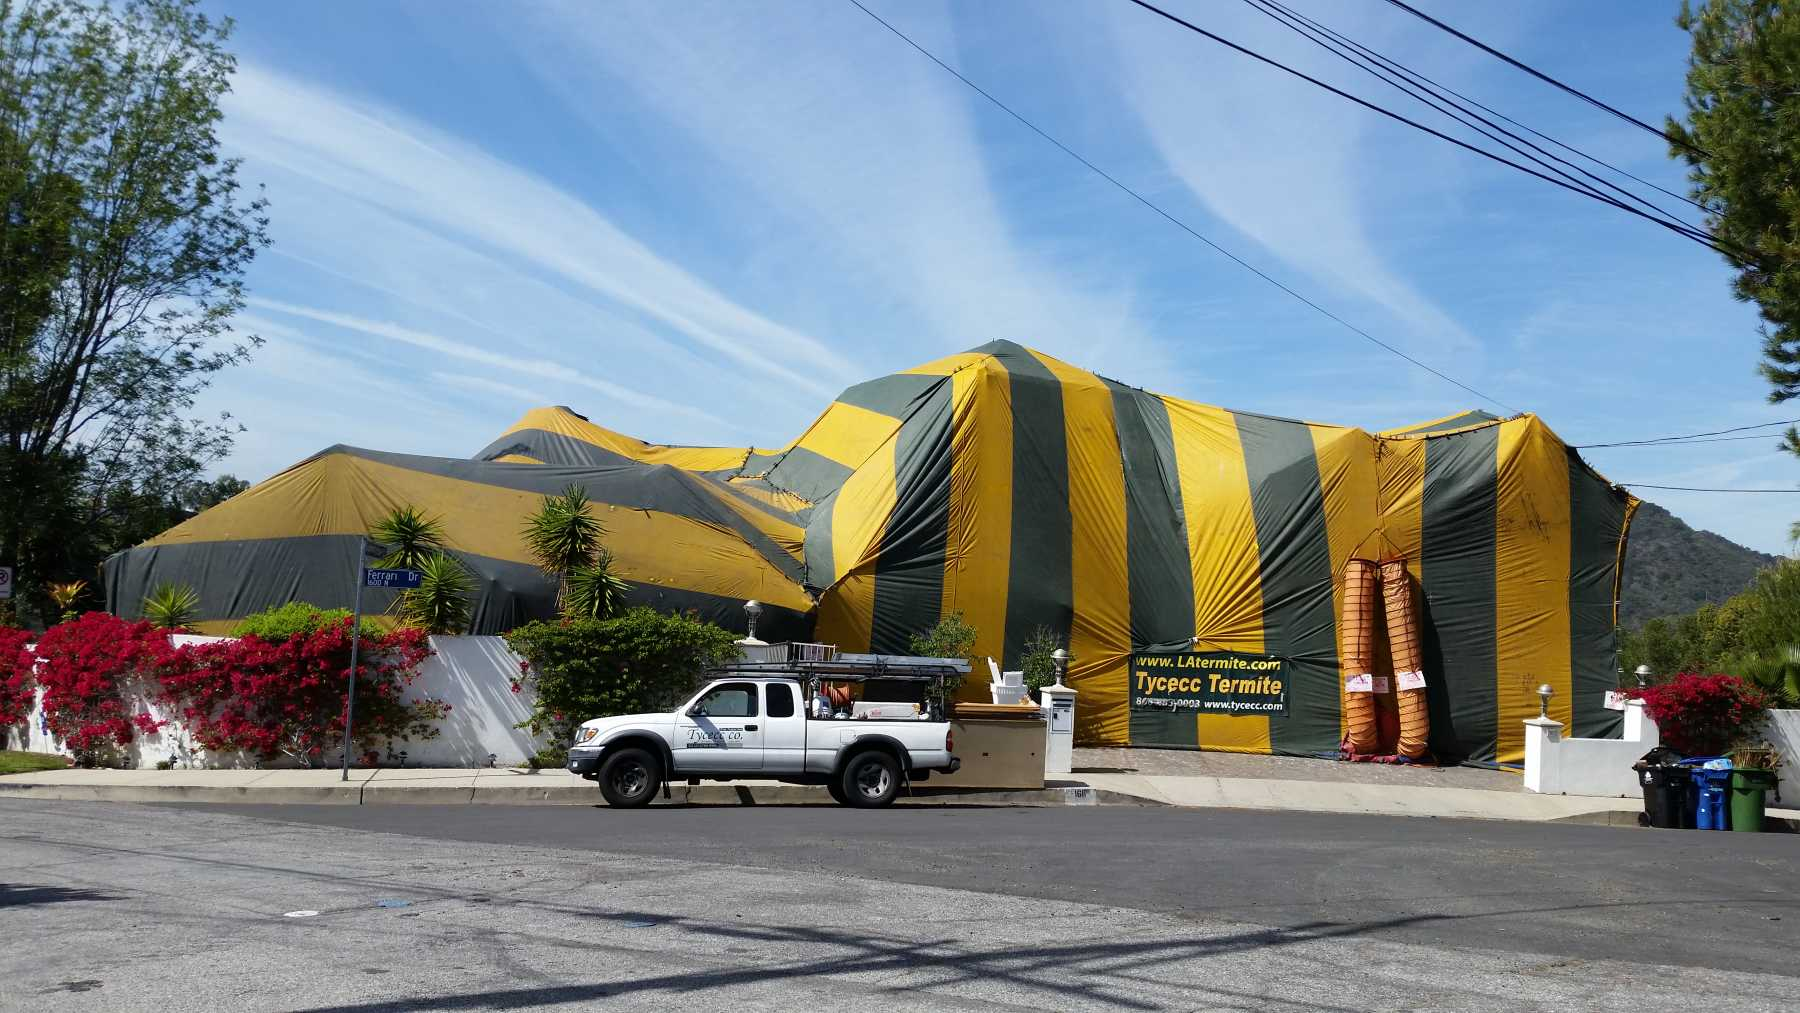 Tycecc Termite Control Pest Exterminator Los Angeles Ca